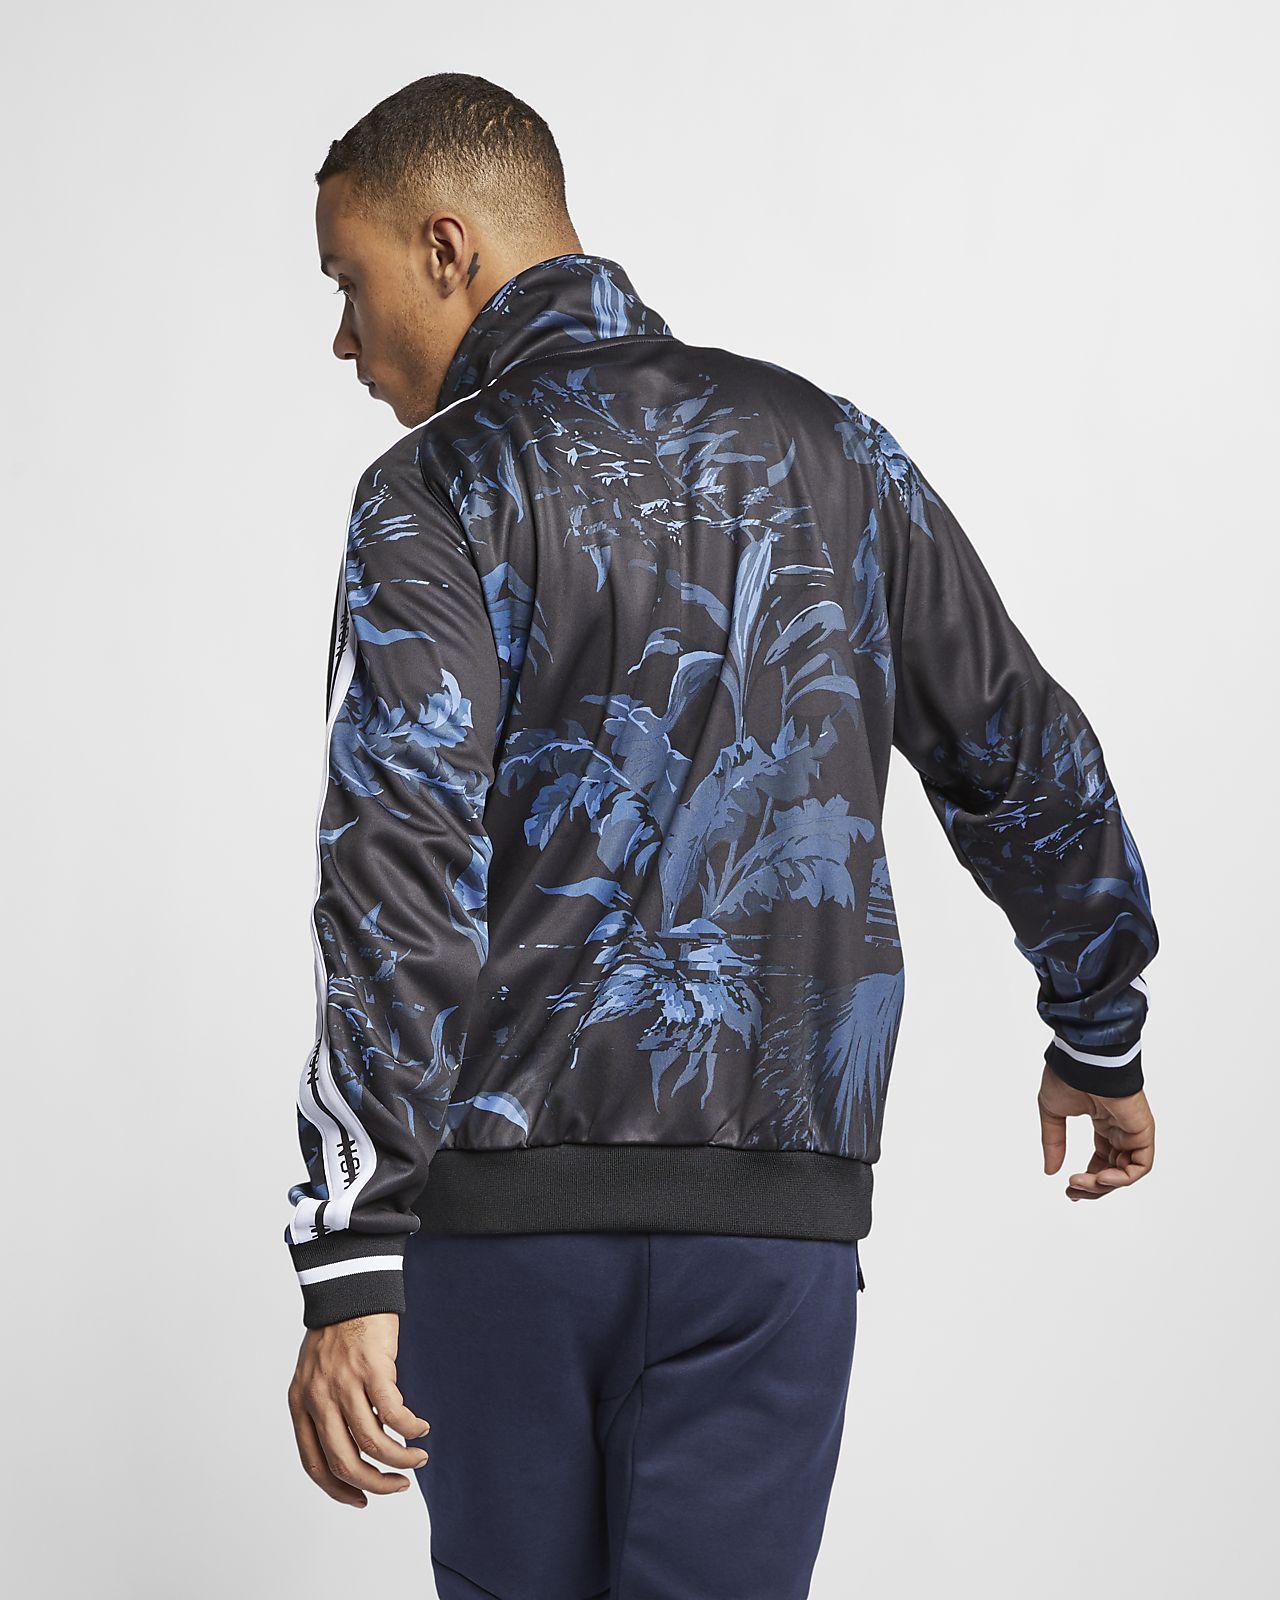 8827614c3cab1a Nike Sportswear NSW Men s Printed Track Jacket. Nike.com ID